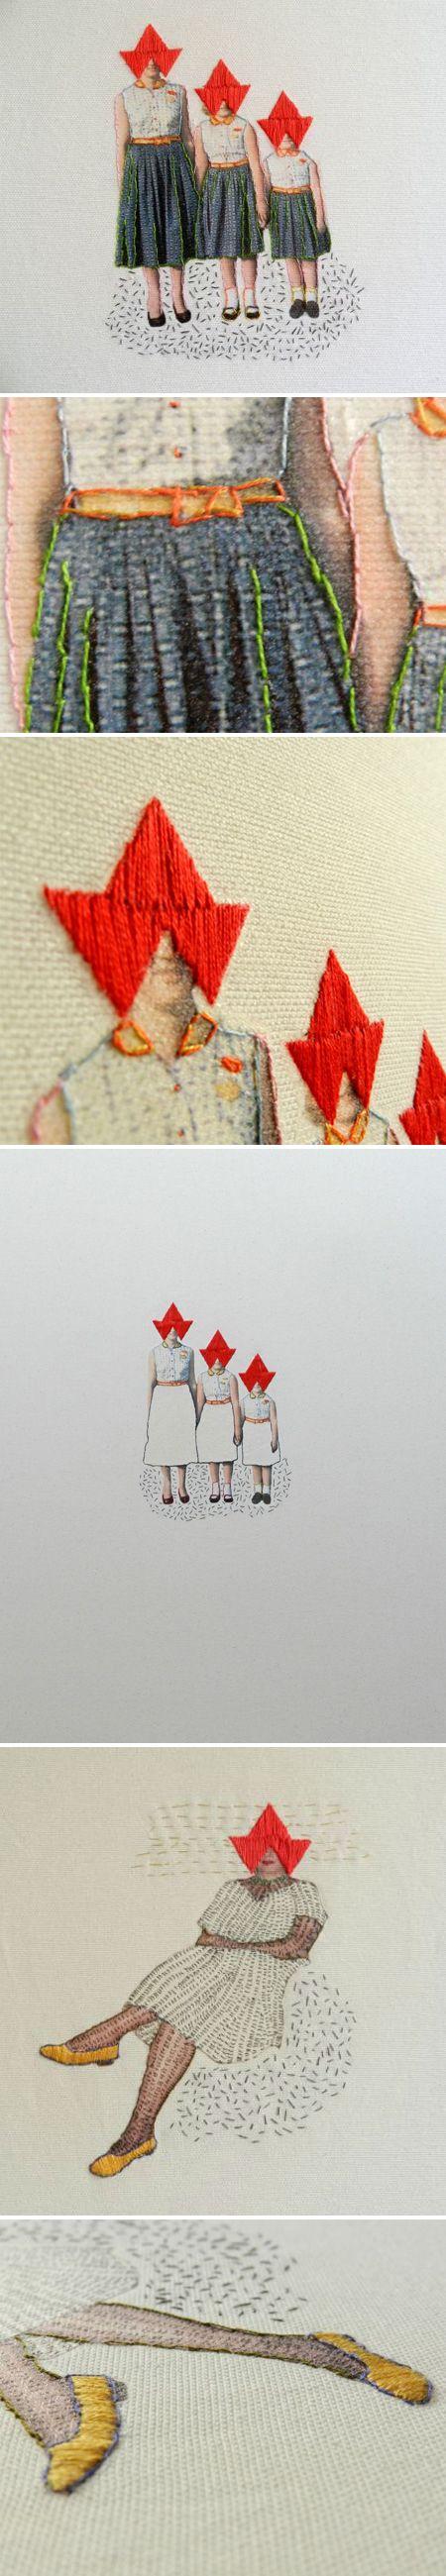 Hagar van hu...: Van Hu, Vans, Stuff, Idea Hagarvanheummen, Hagarvanheummen Needleworks, Hagarvanheummen Jpg 450 2601, Hagar Vanheummen, Textile Art